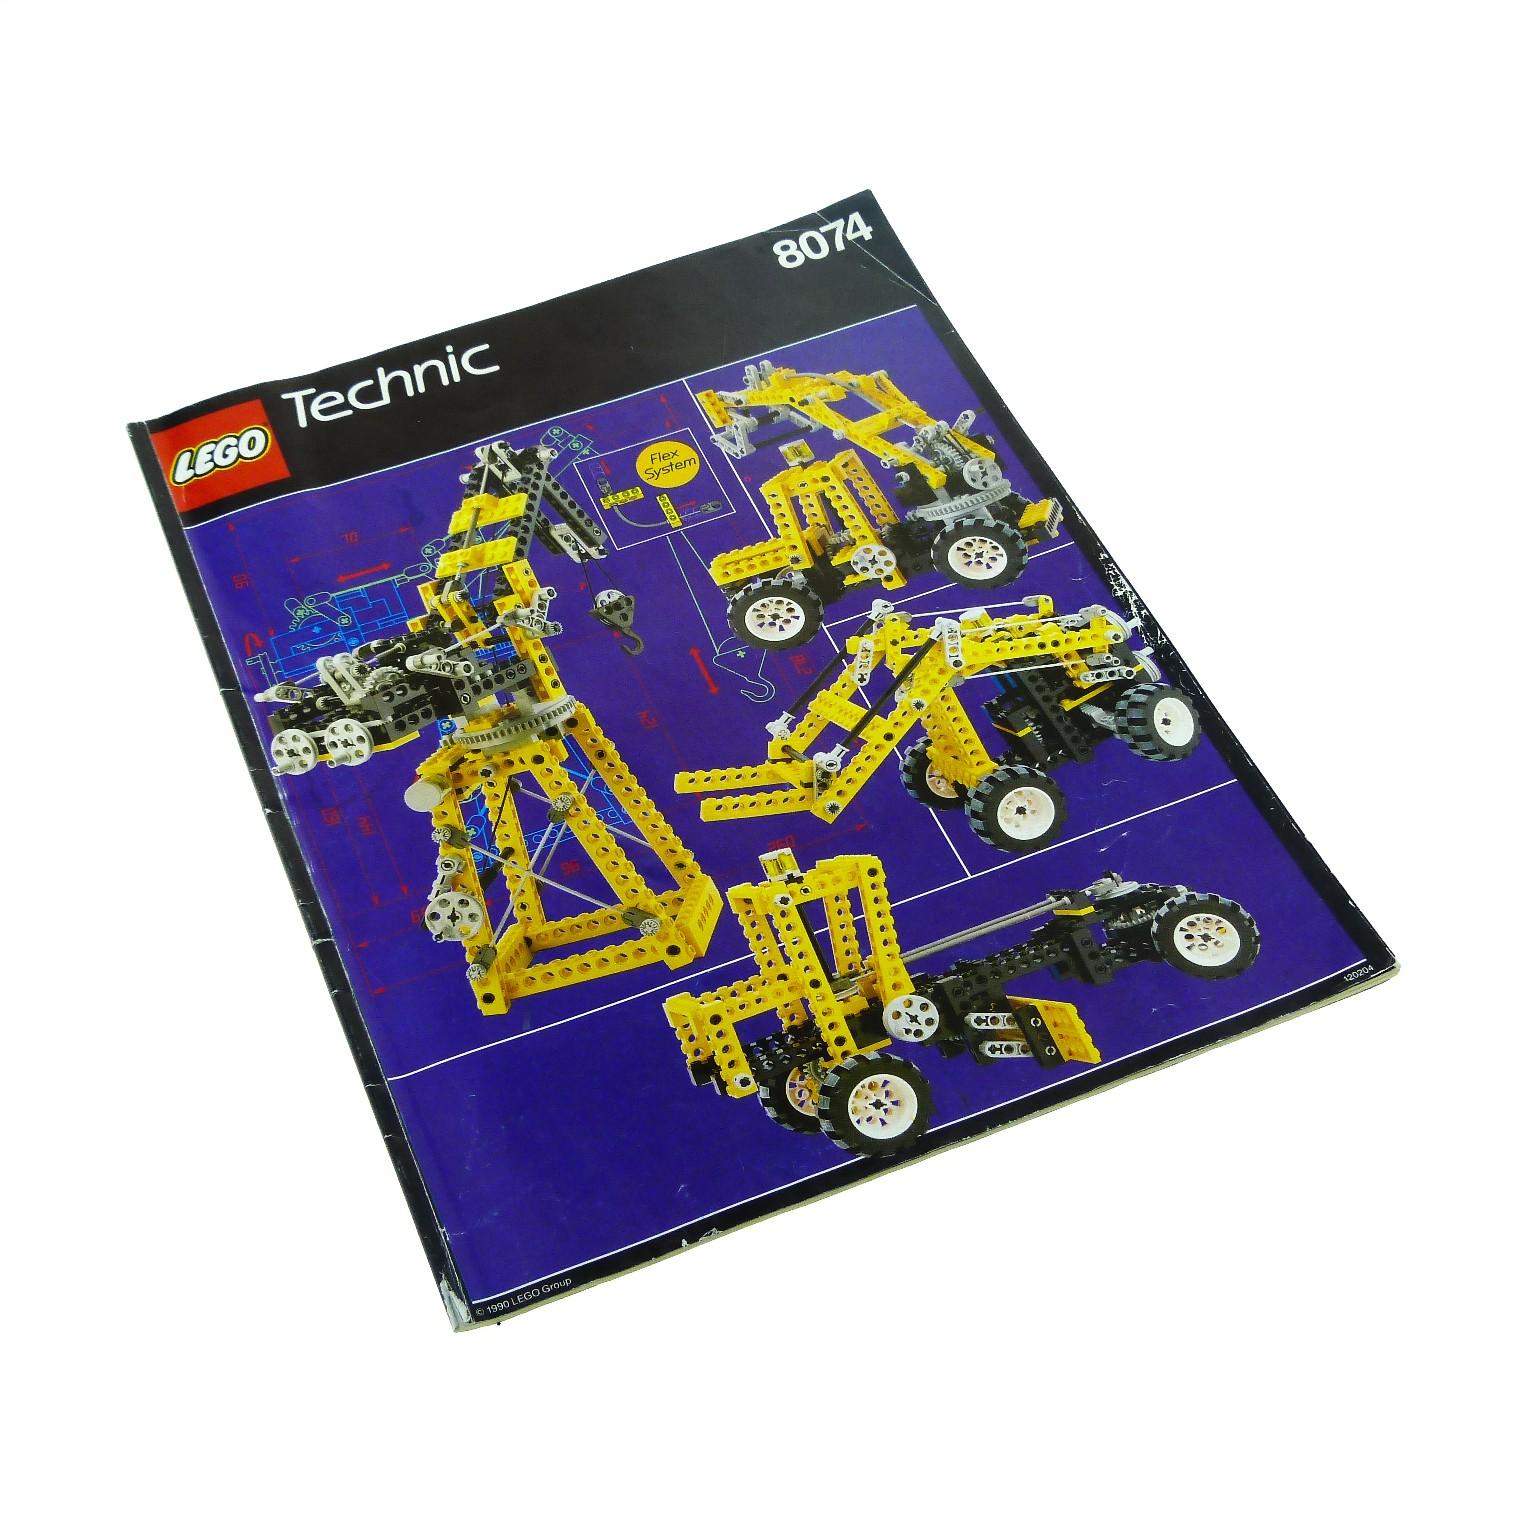 1 X Lego Brick Instructions For Set Technic Building Universal Set